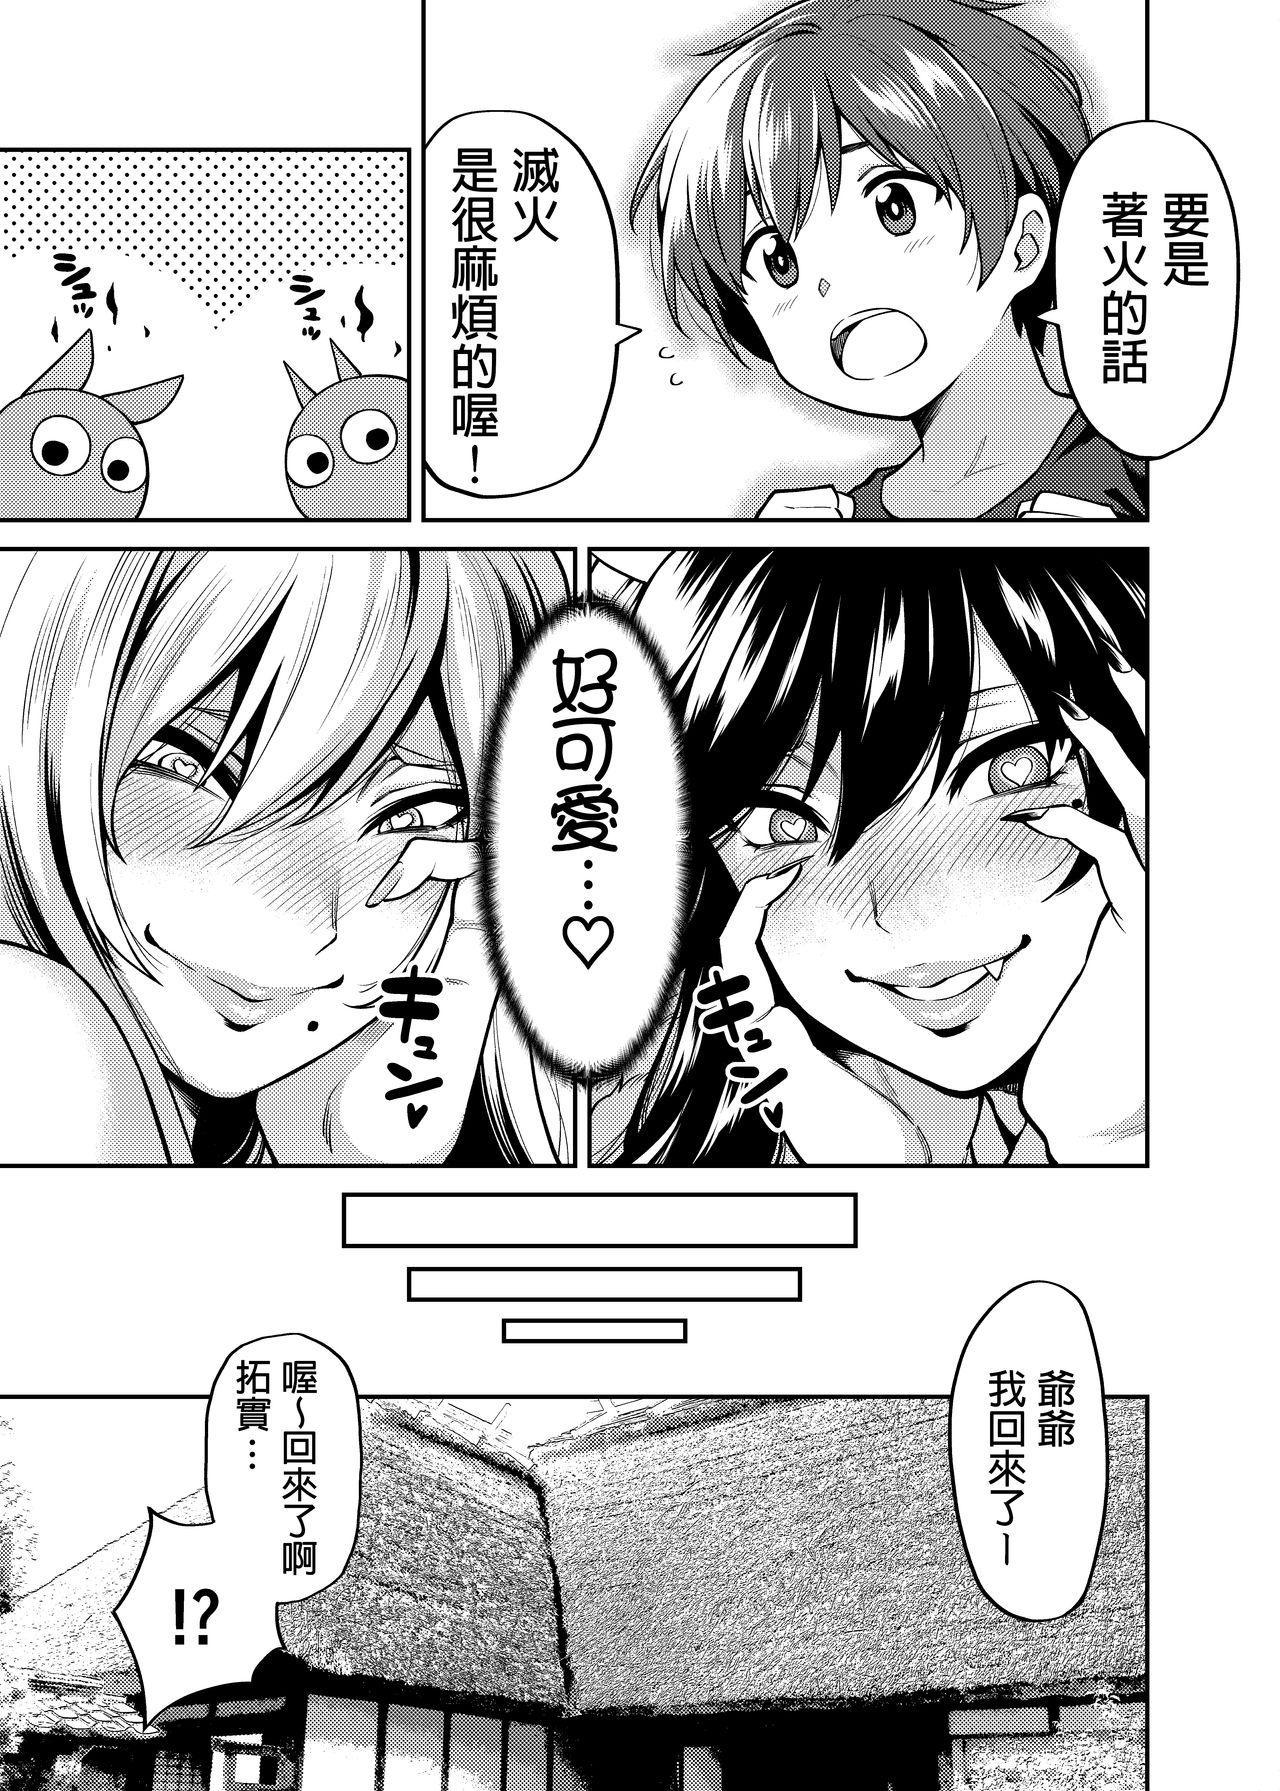 Takkun to Kitsune no Onee-san 25